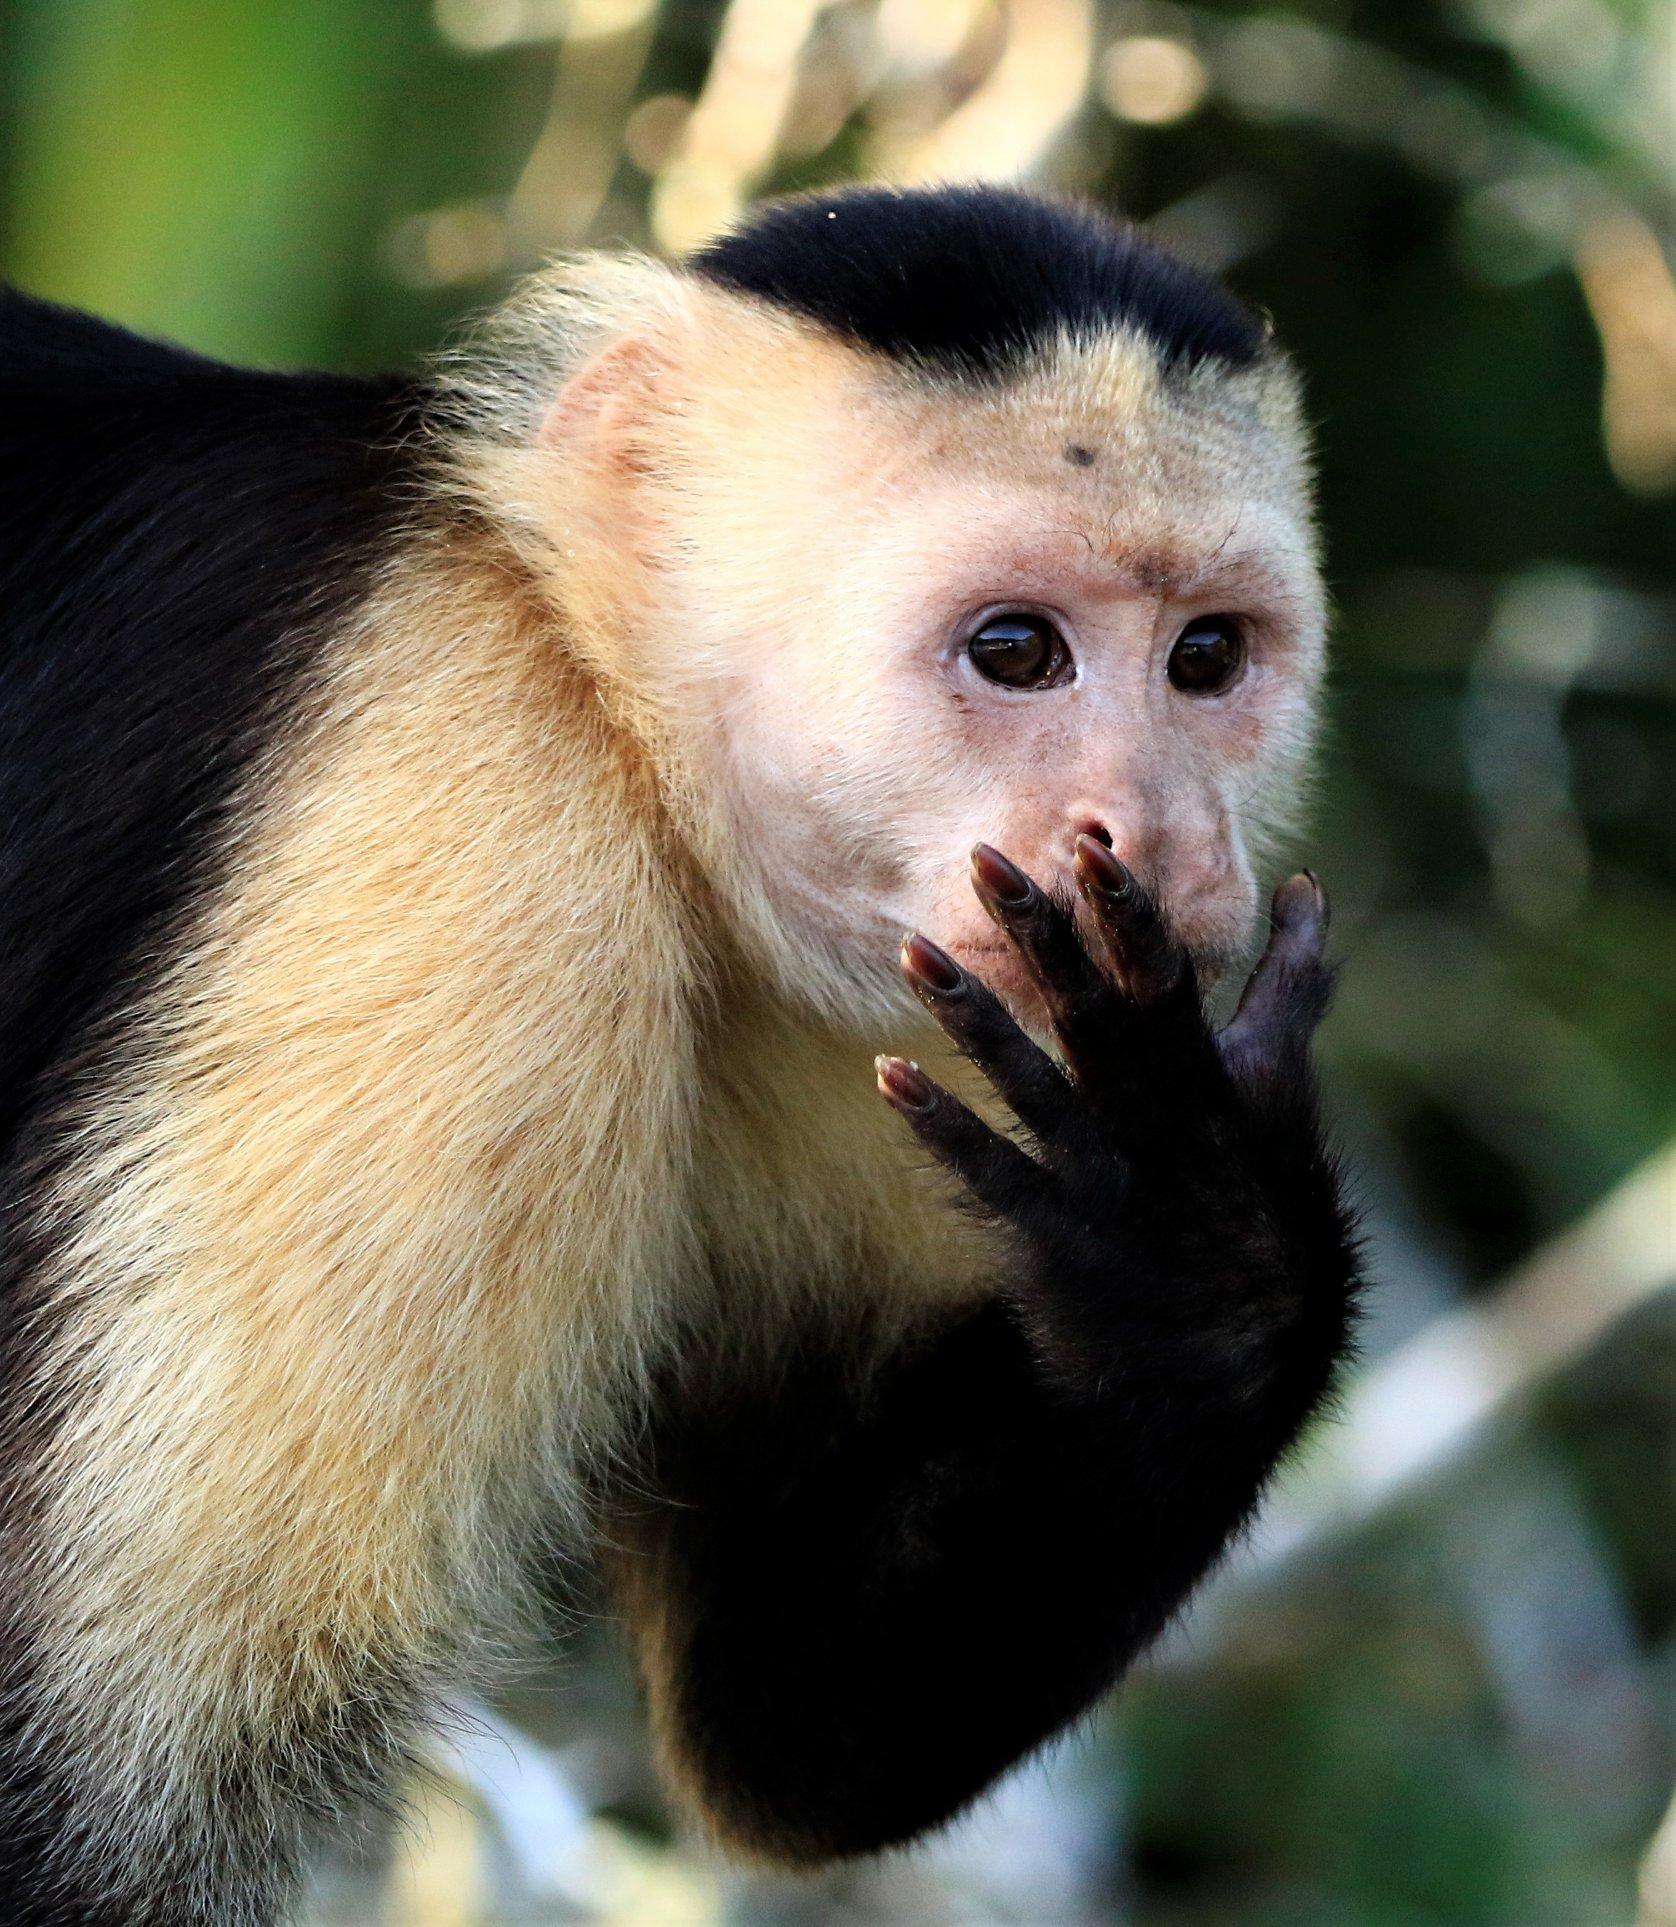 #Capuchin